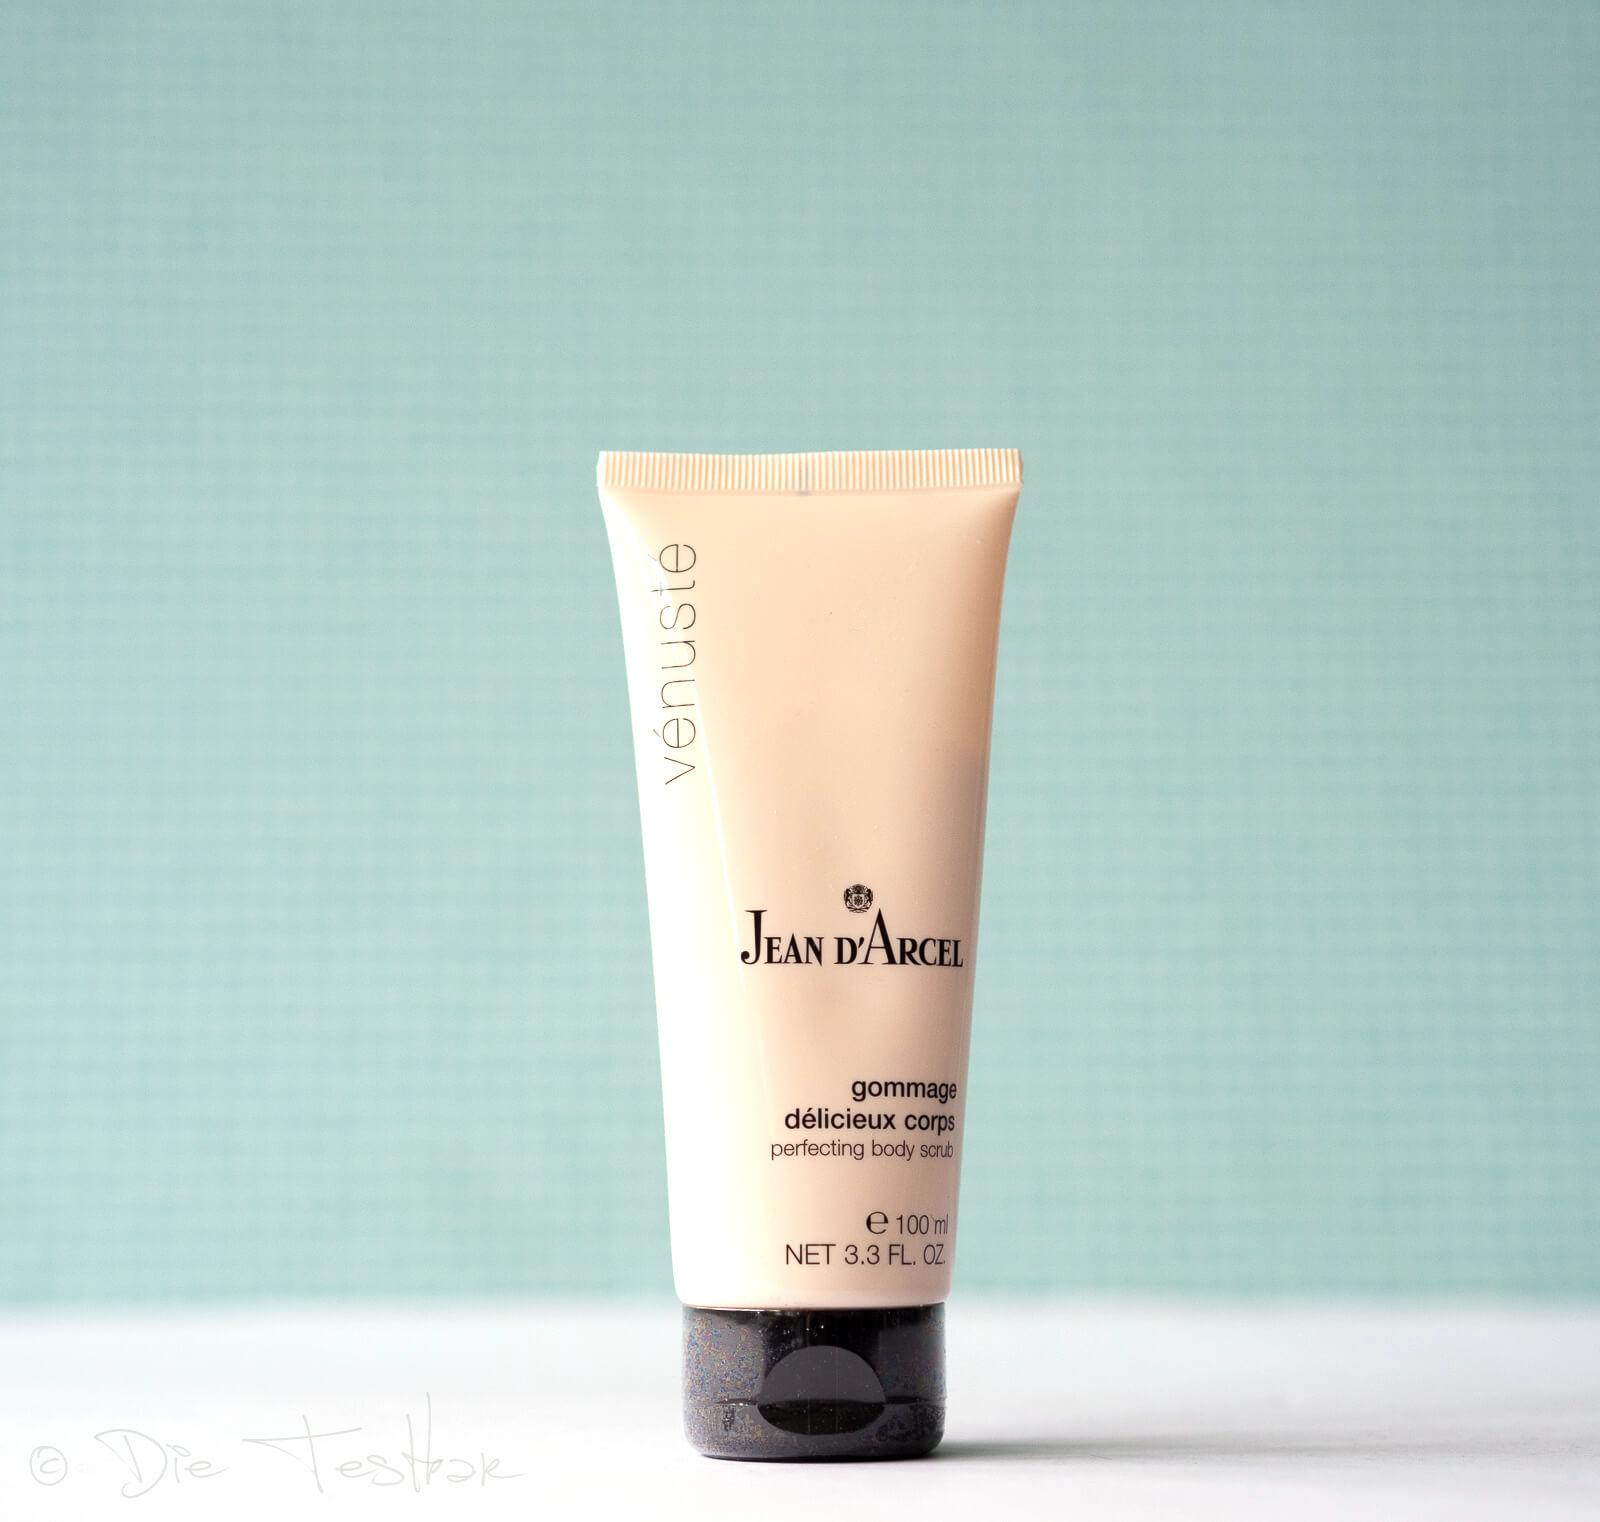 JEAN D'ARCEL - perfecting body scrub